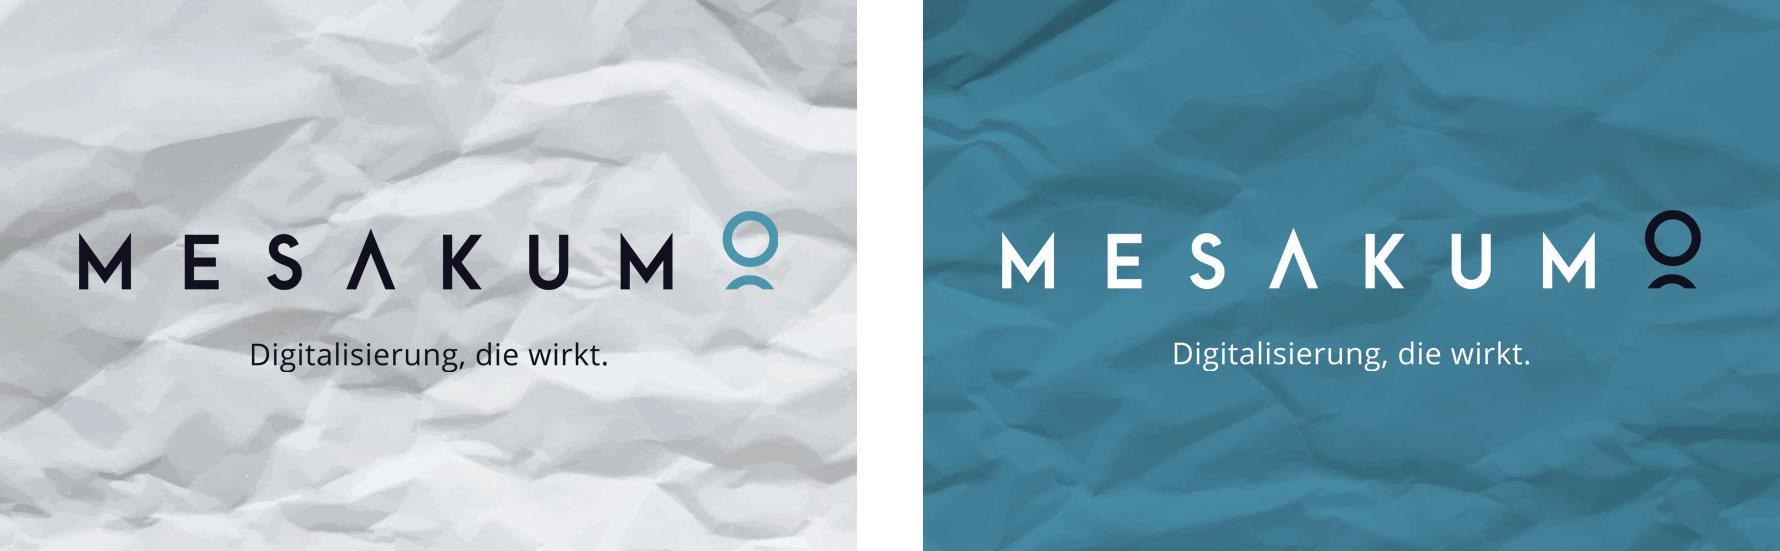 Hüfner Design | Referenz mesakumo | Logo